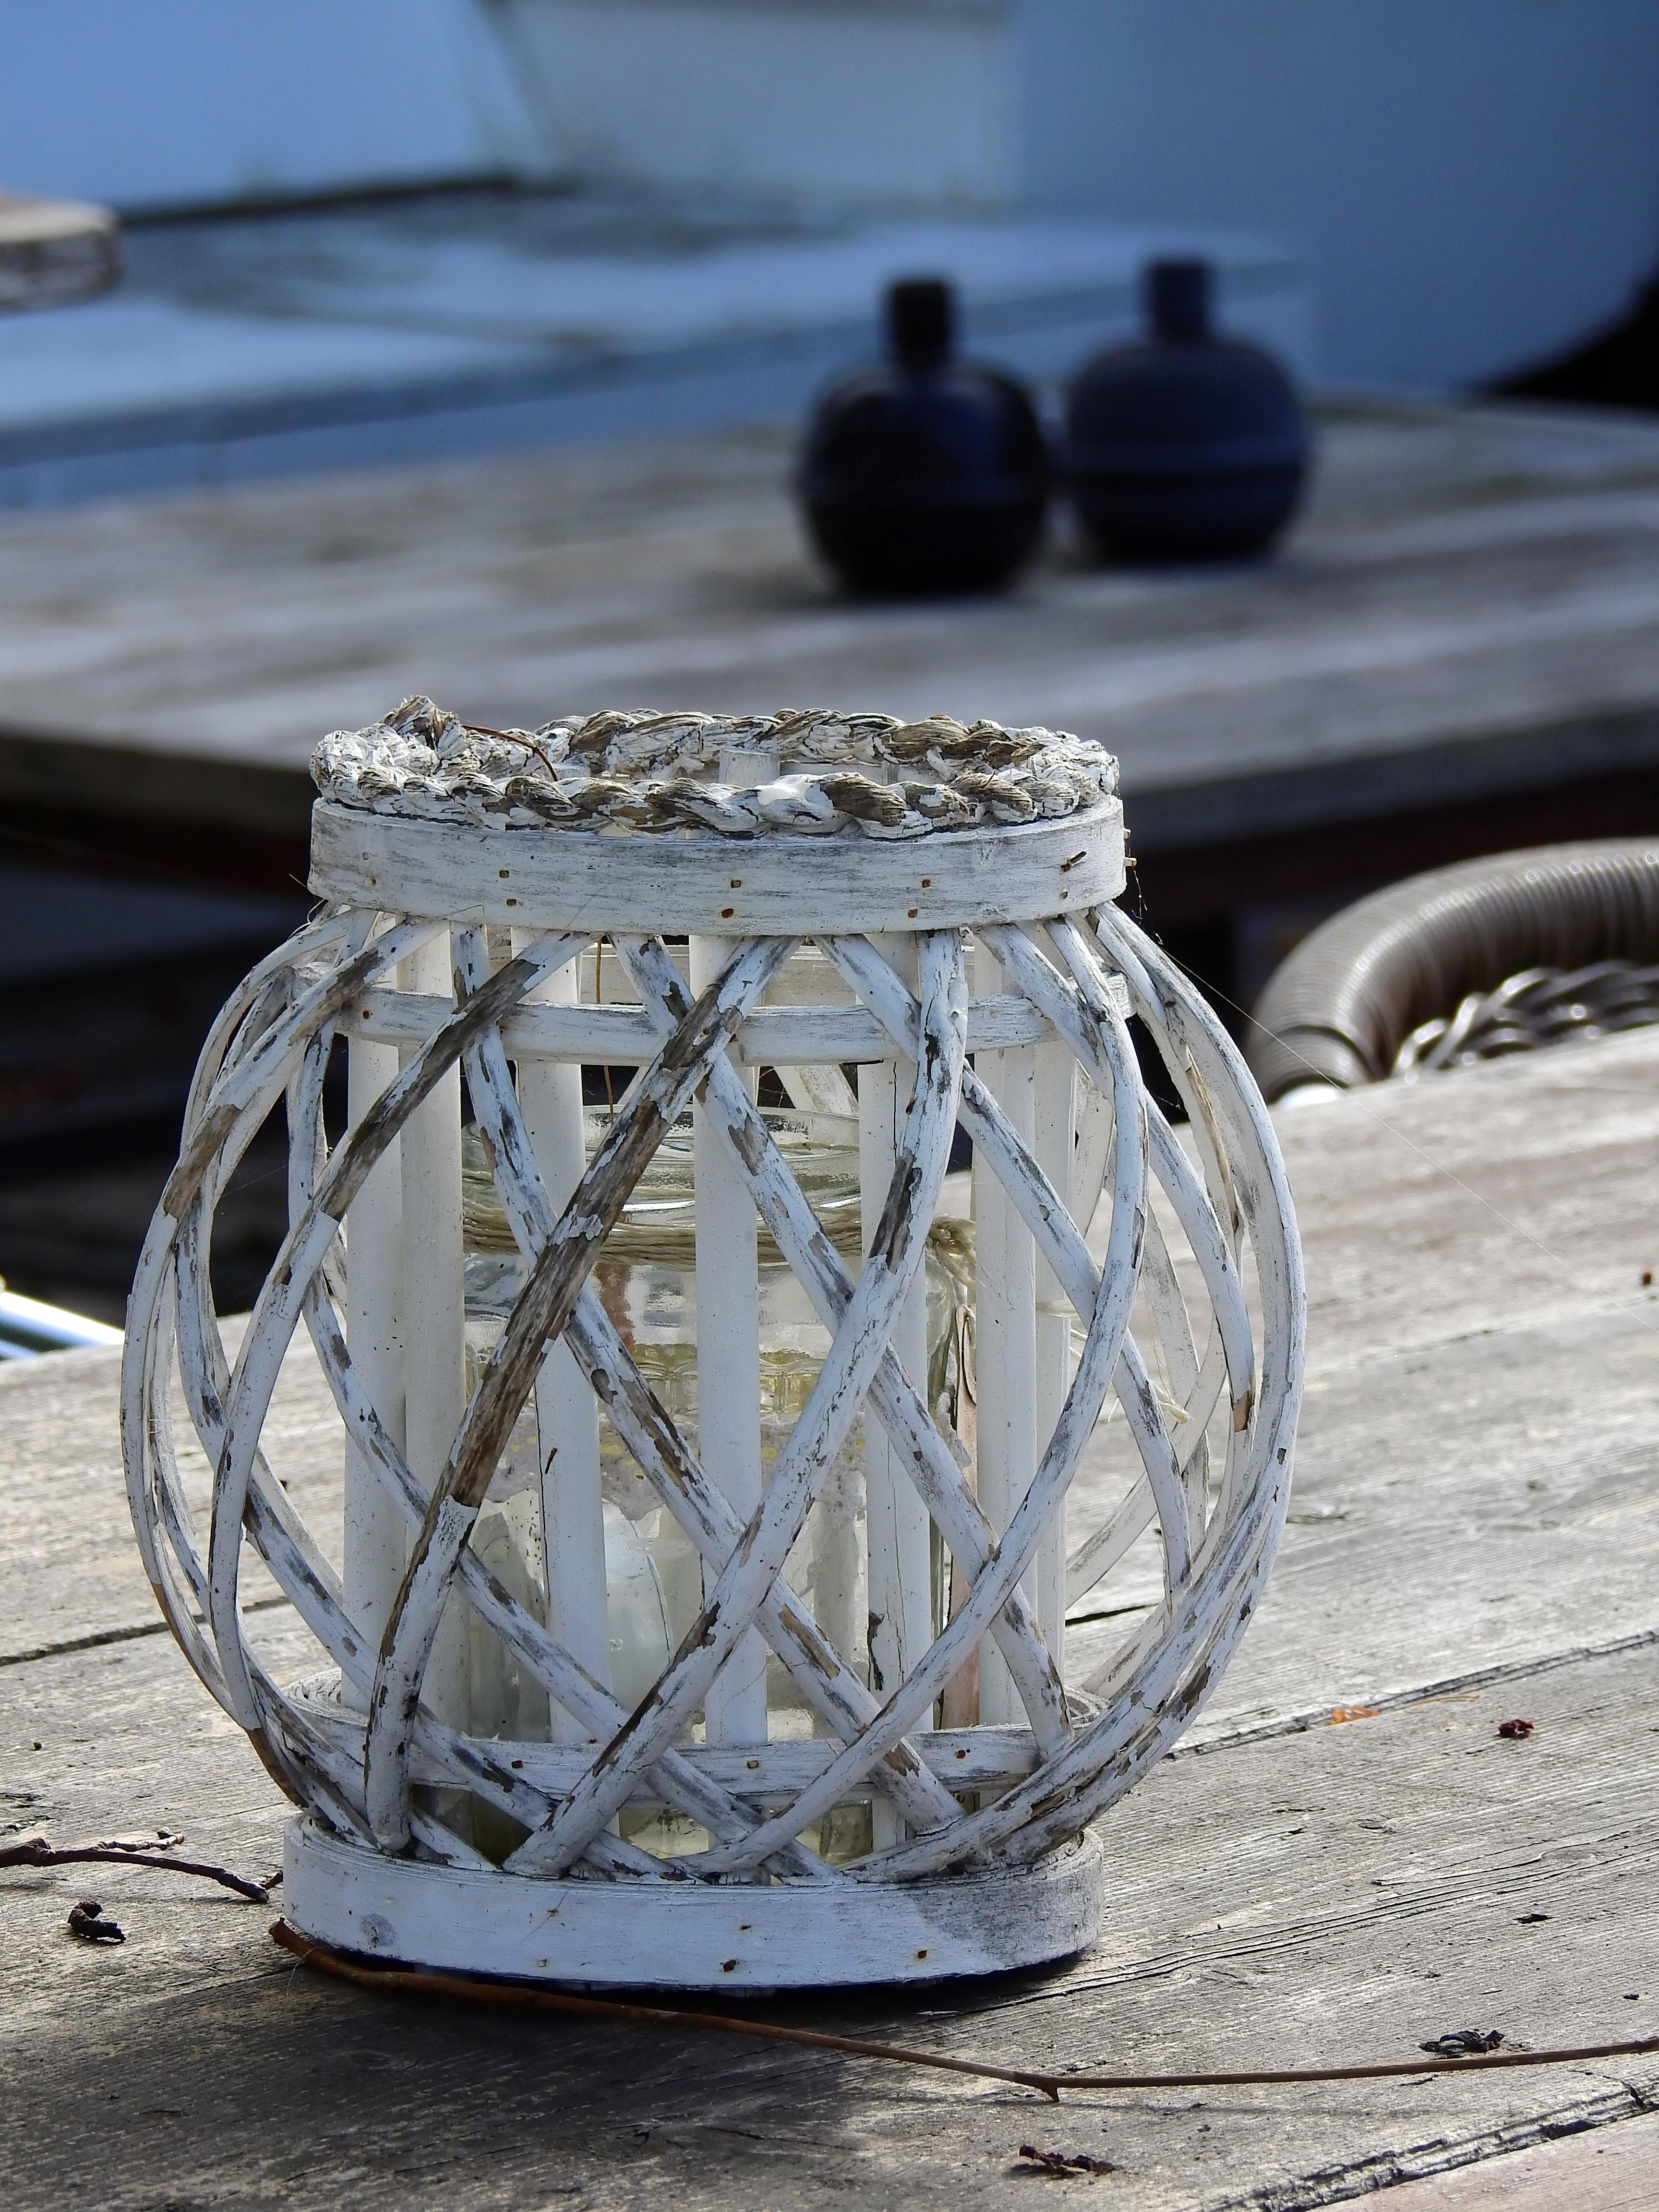 Bakgrundsbilder hjul glas vas dekoration lykta - Glas gartendeko ...